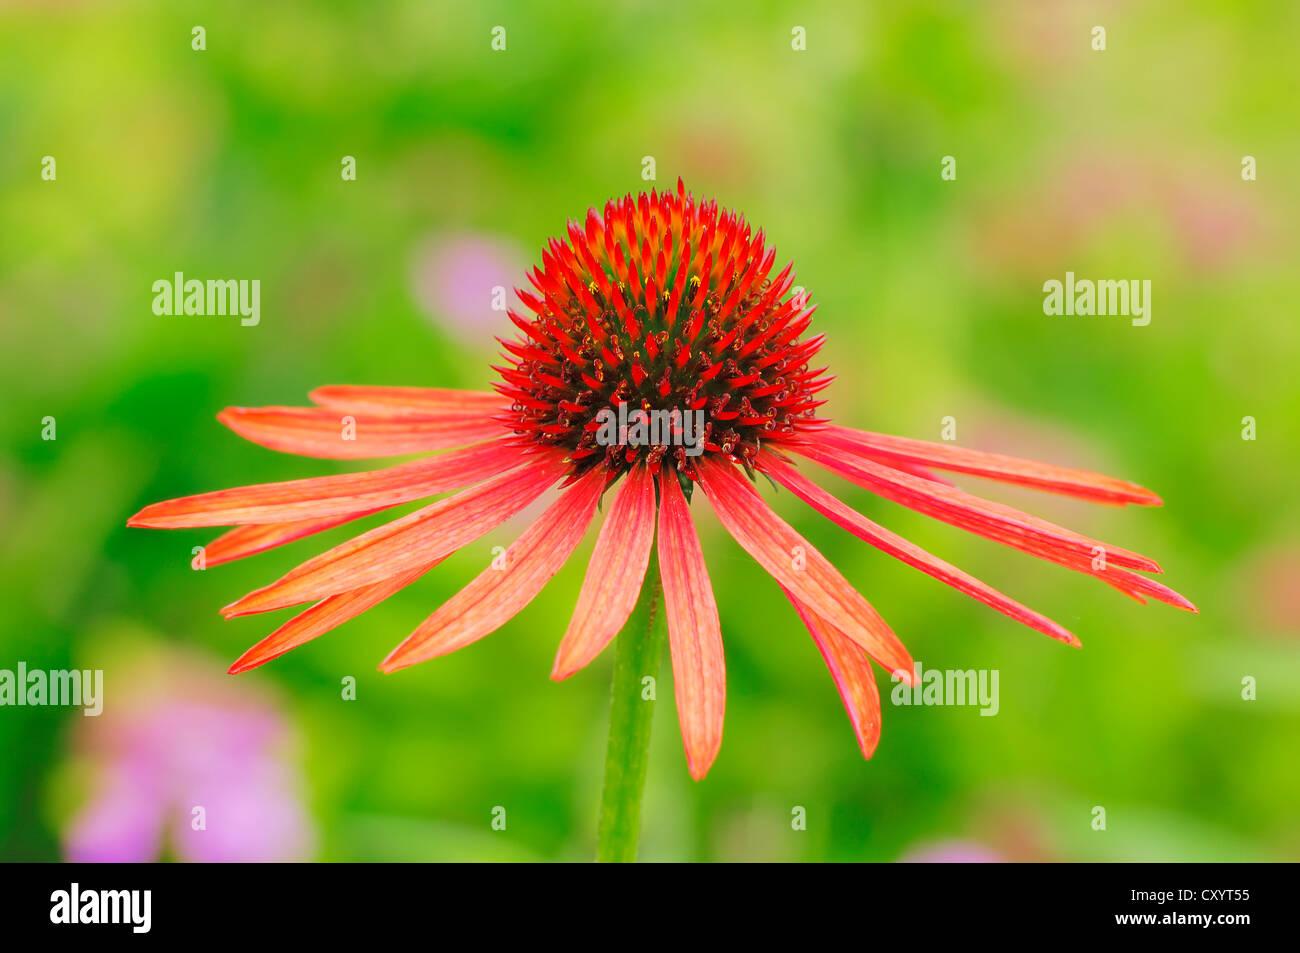 Eastern purple coneflower, purple coneflower (Echinacea purpurea, Rudbeckia purpurea), blossom, garden plant - Stock Image